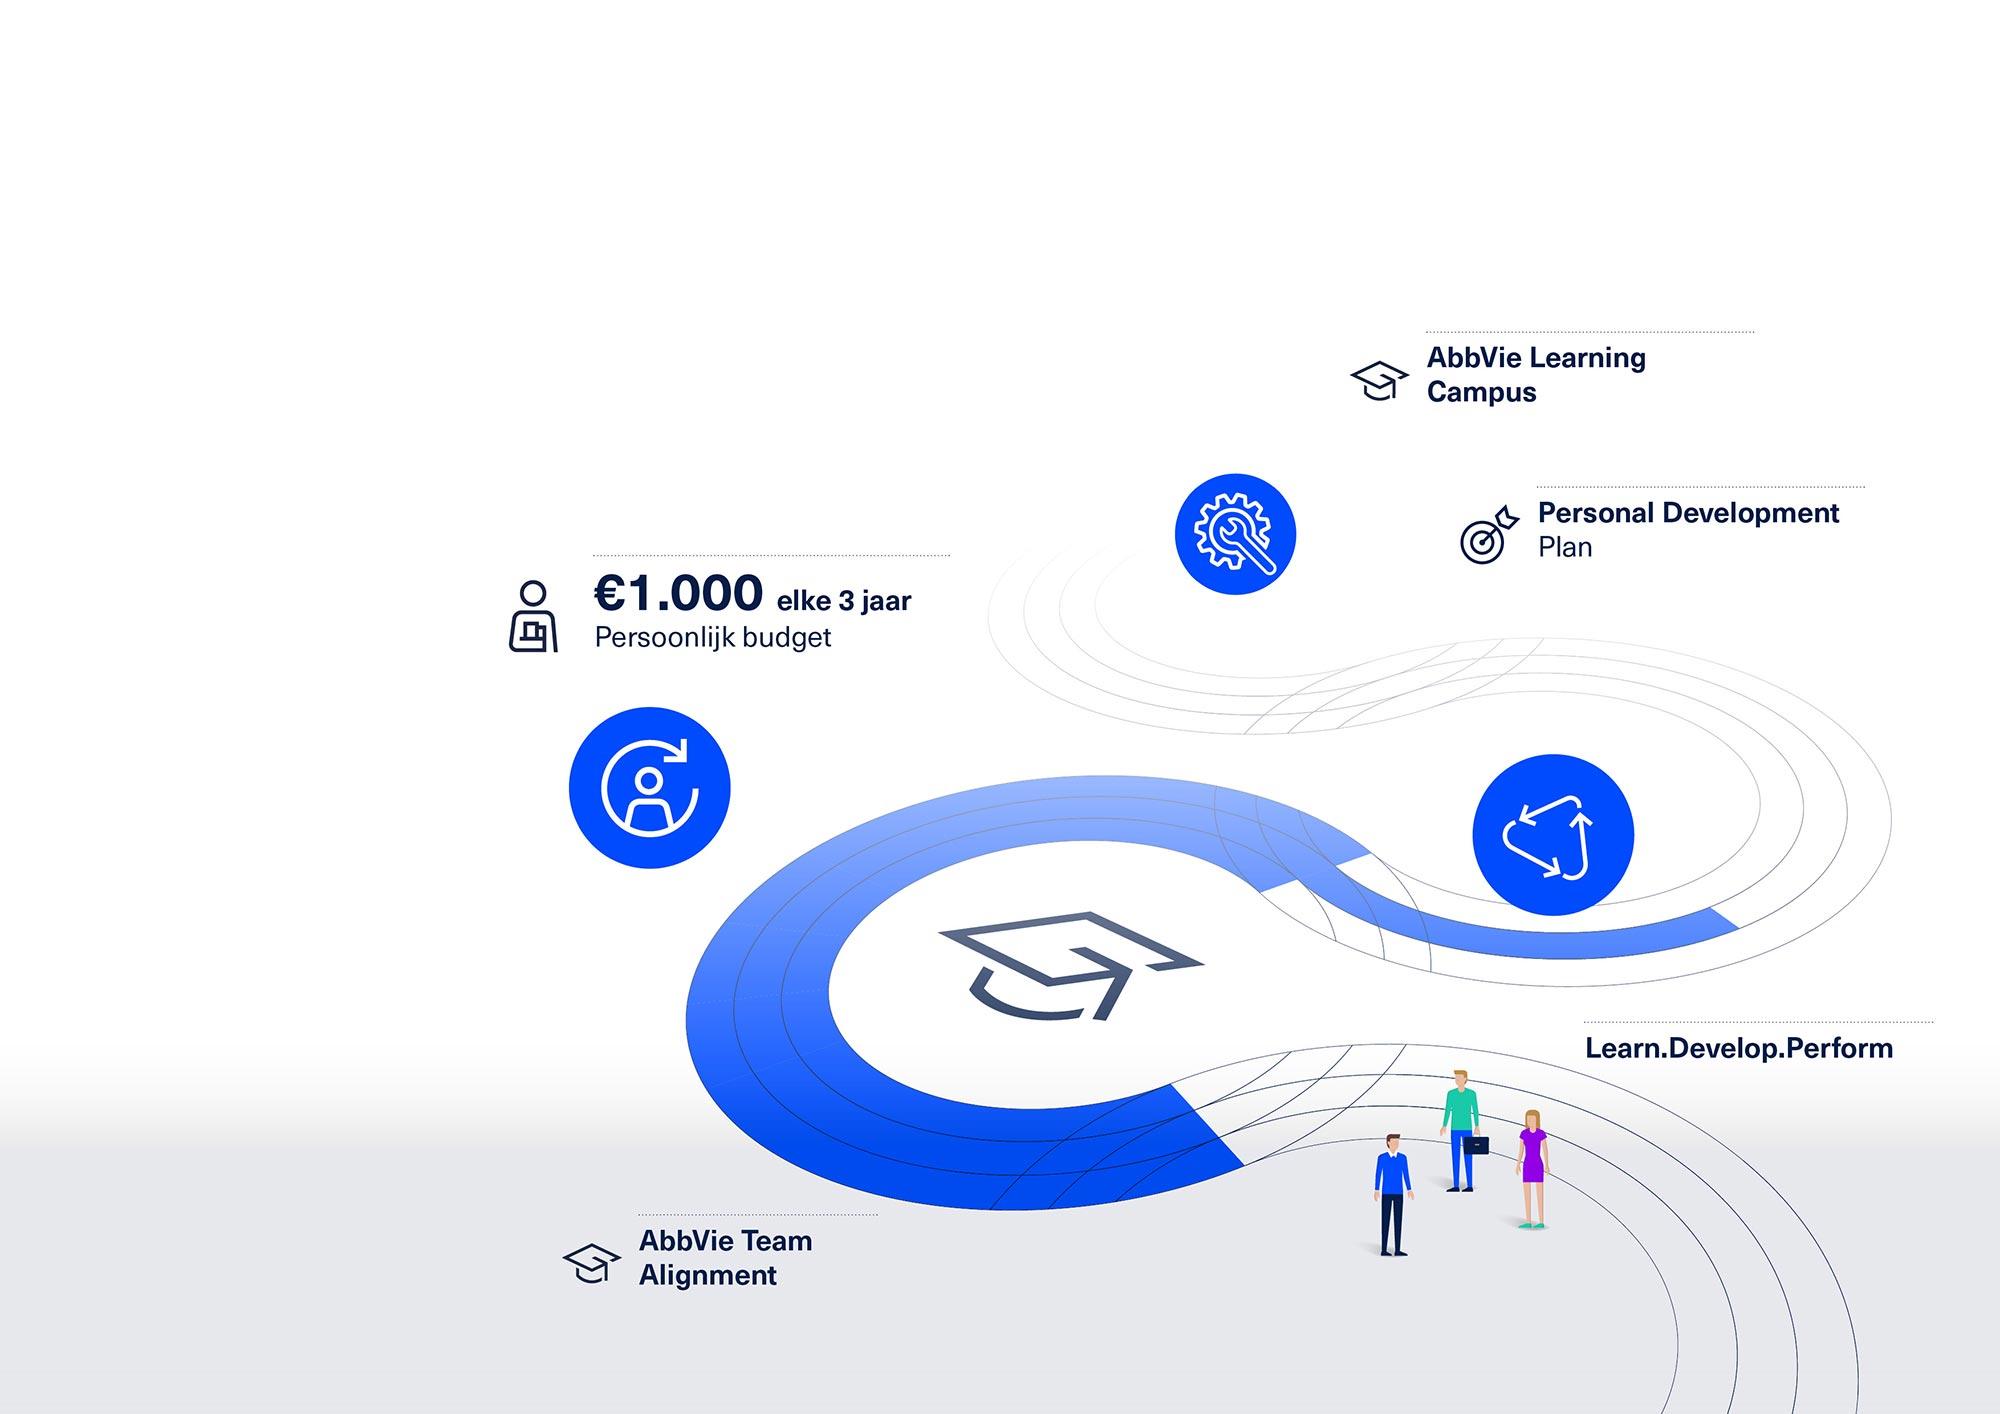 Abbvie Culture Audit visuals BEX Communicatie infographic ontwerp JAgd 3